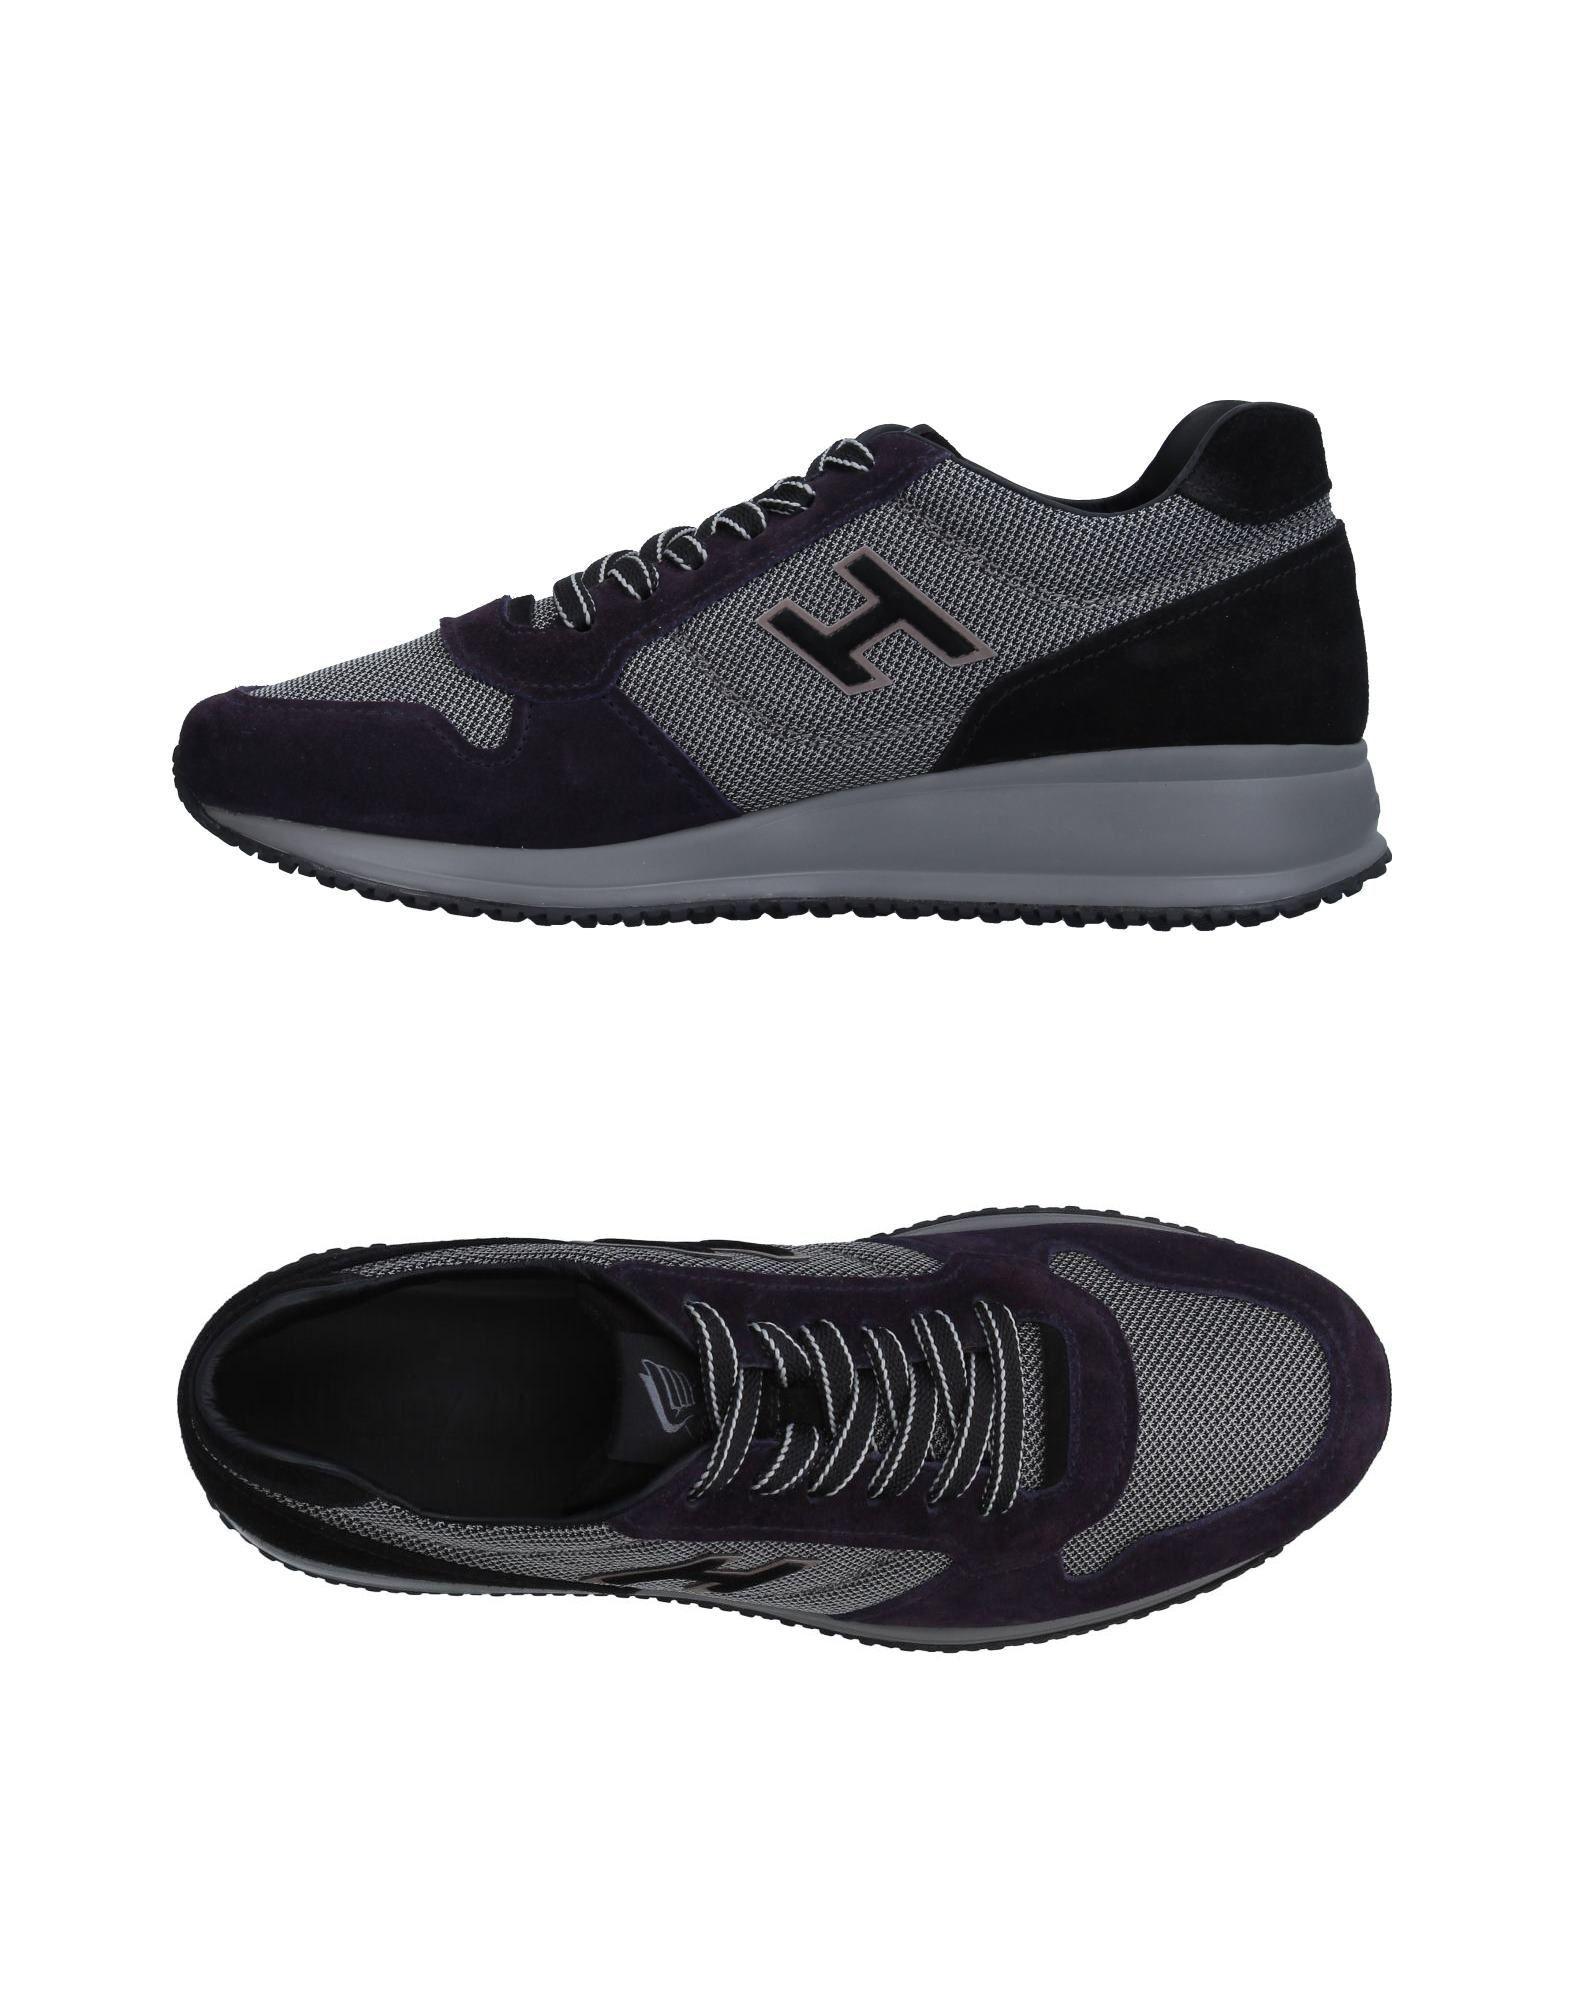 Hogan Sneakers Herren  11296944SD Gute Qualität beliebte Schuhe